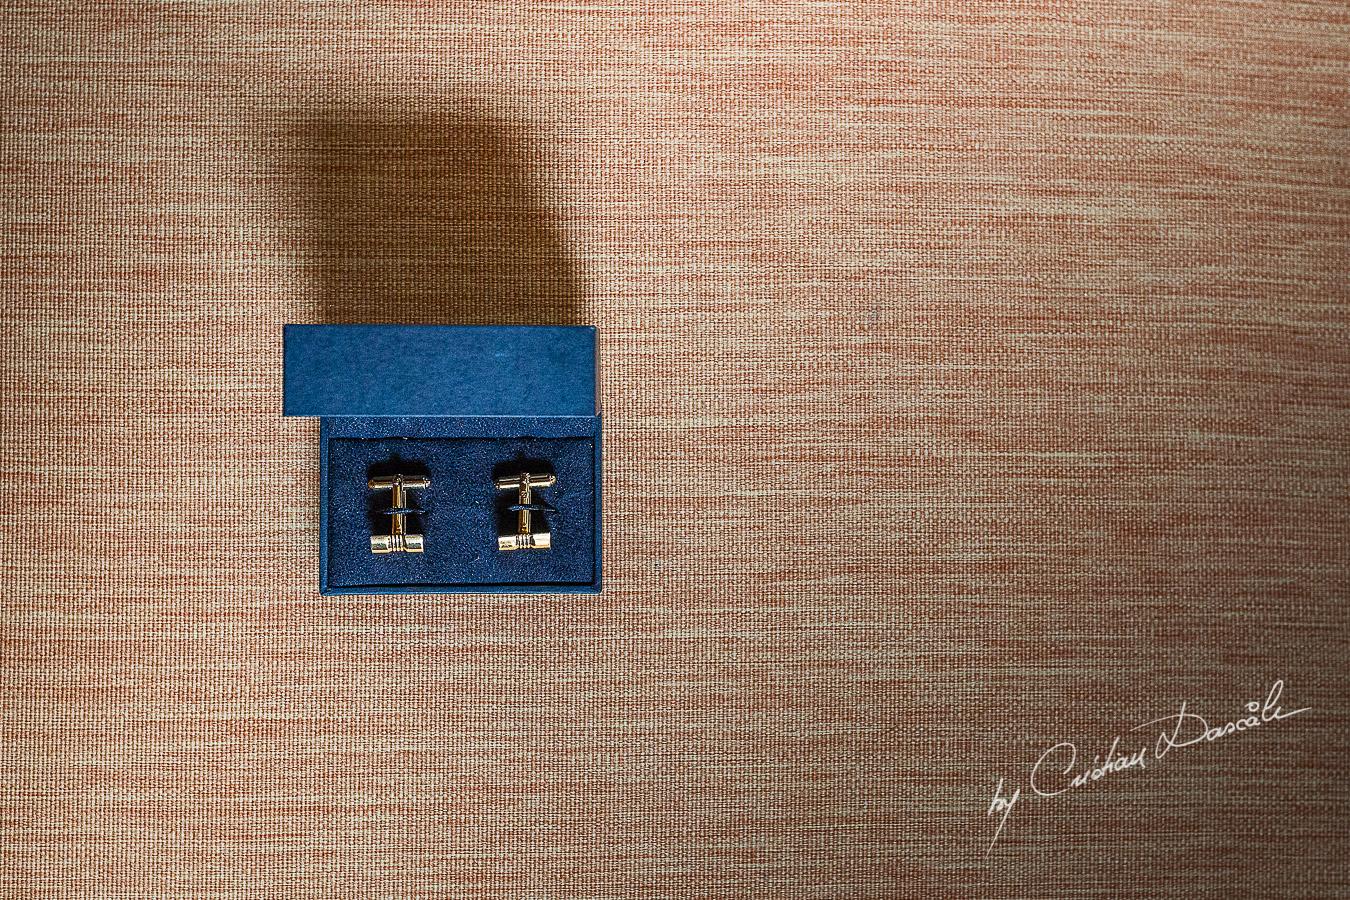 Groom's cuff-links captured at Elysium Hotel in Paphos.